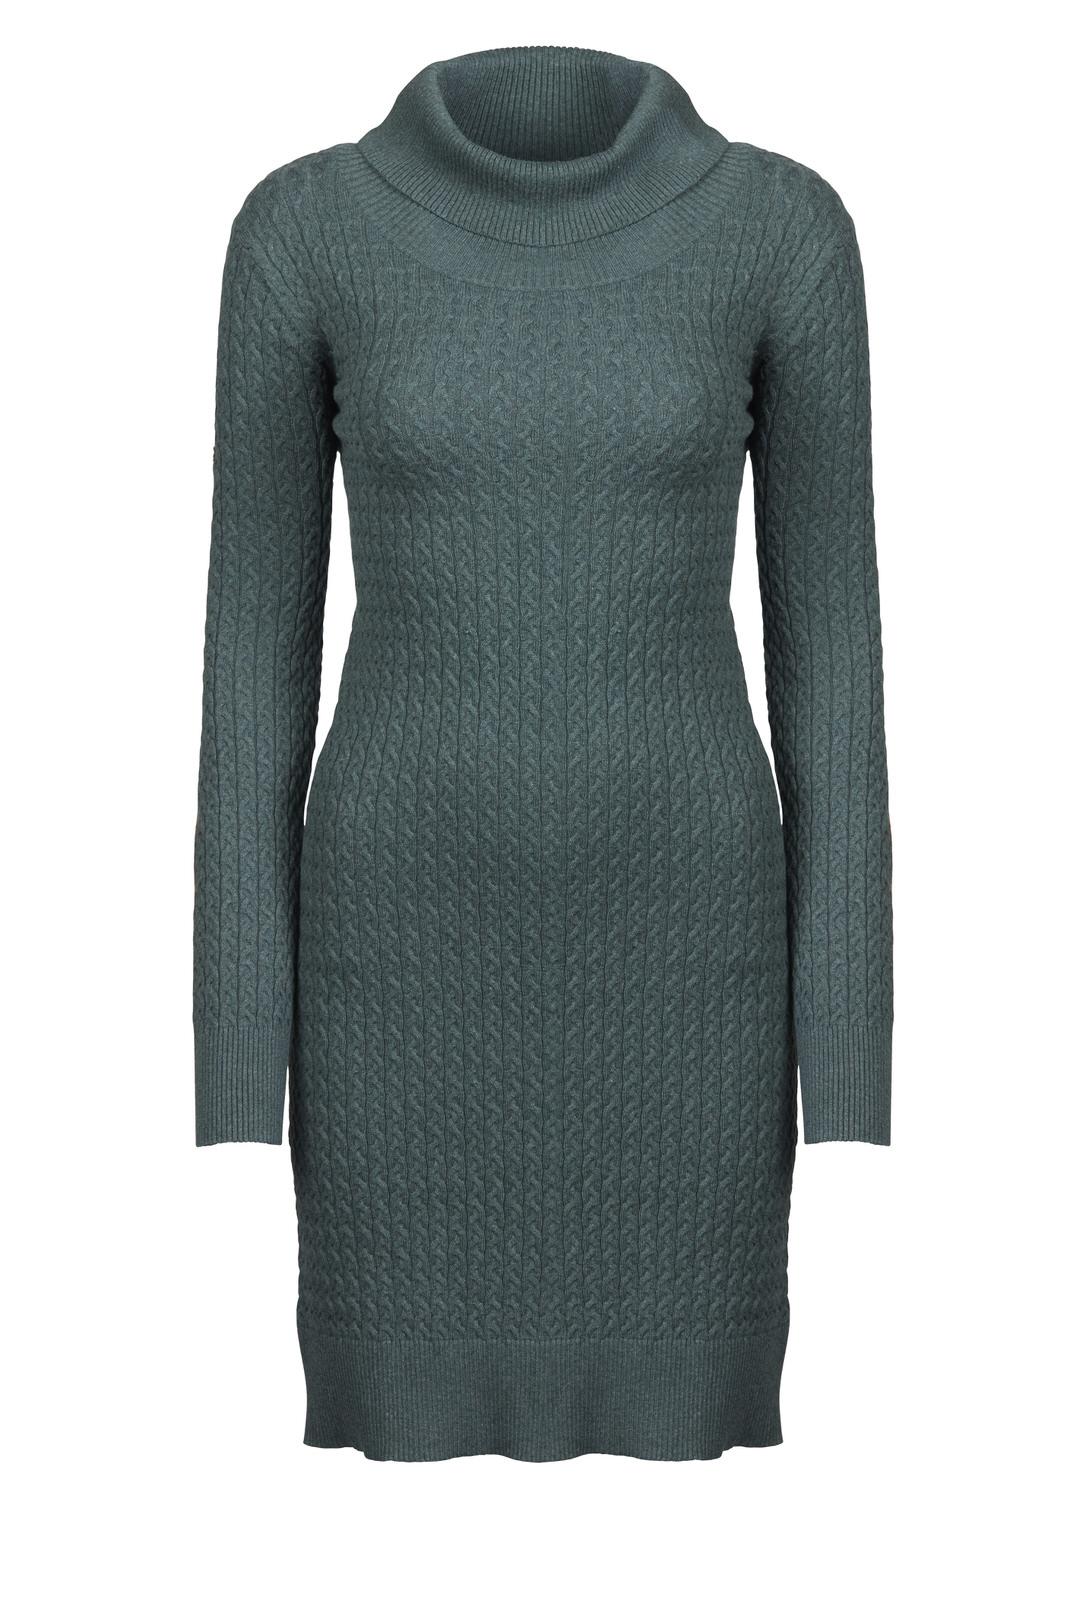 Dubarry_ Renvyle Sweater Dress - Verdigris_Image_2